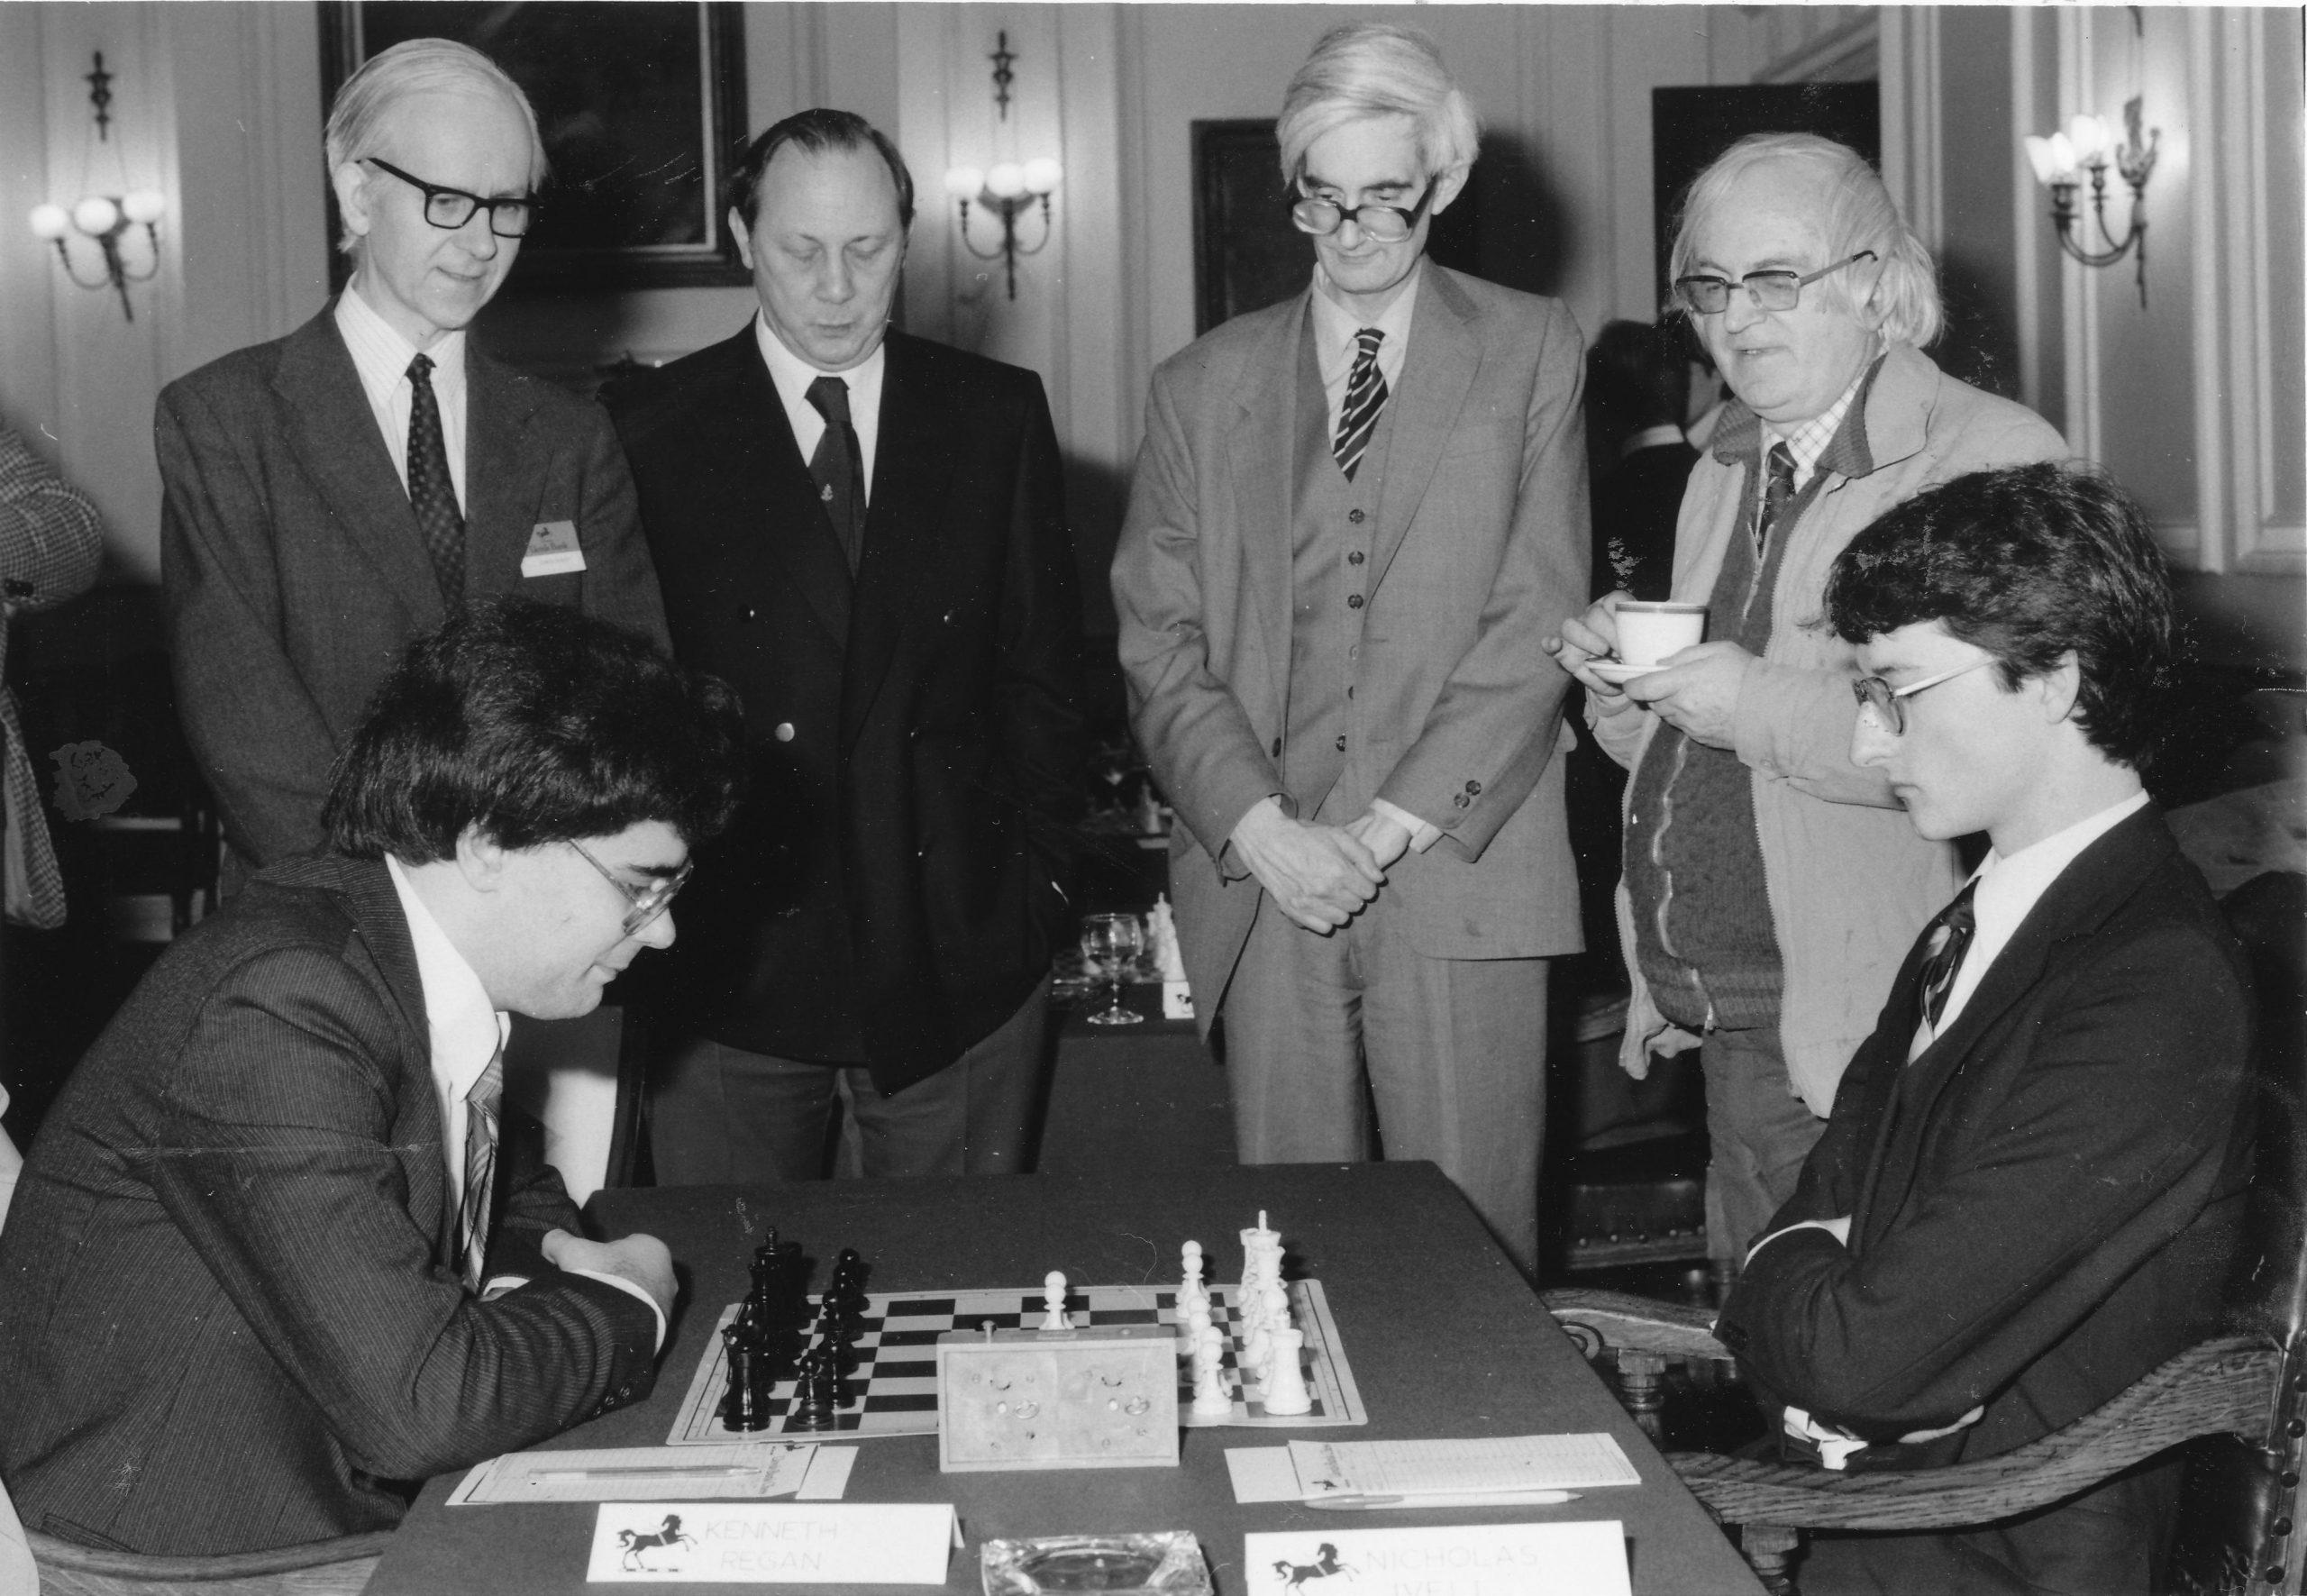 Leonard Barden, Henry Mutkin, Adrian Hollis and Bob Wade observe Nick Ivell vs Ken Regan at the 1983 Varsity match